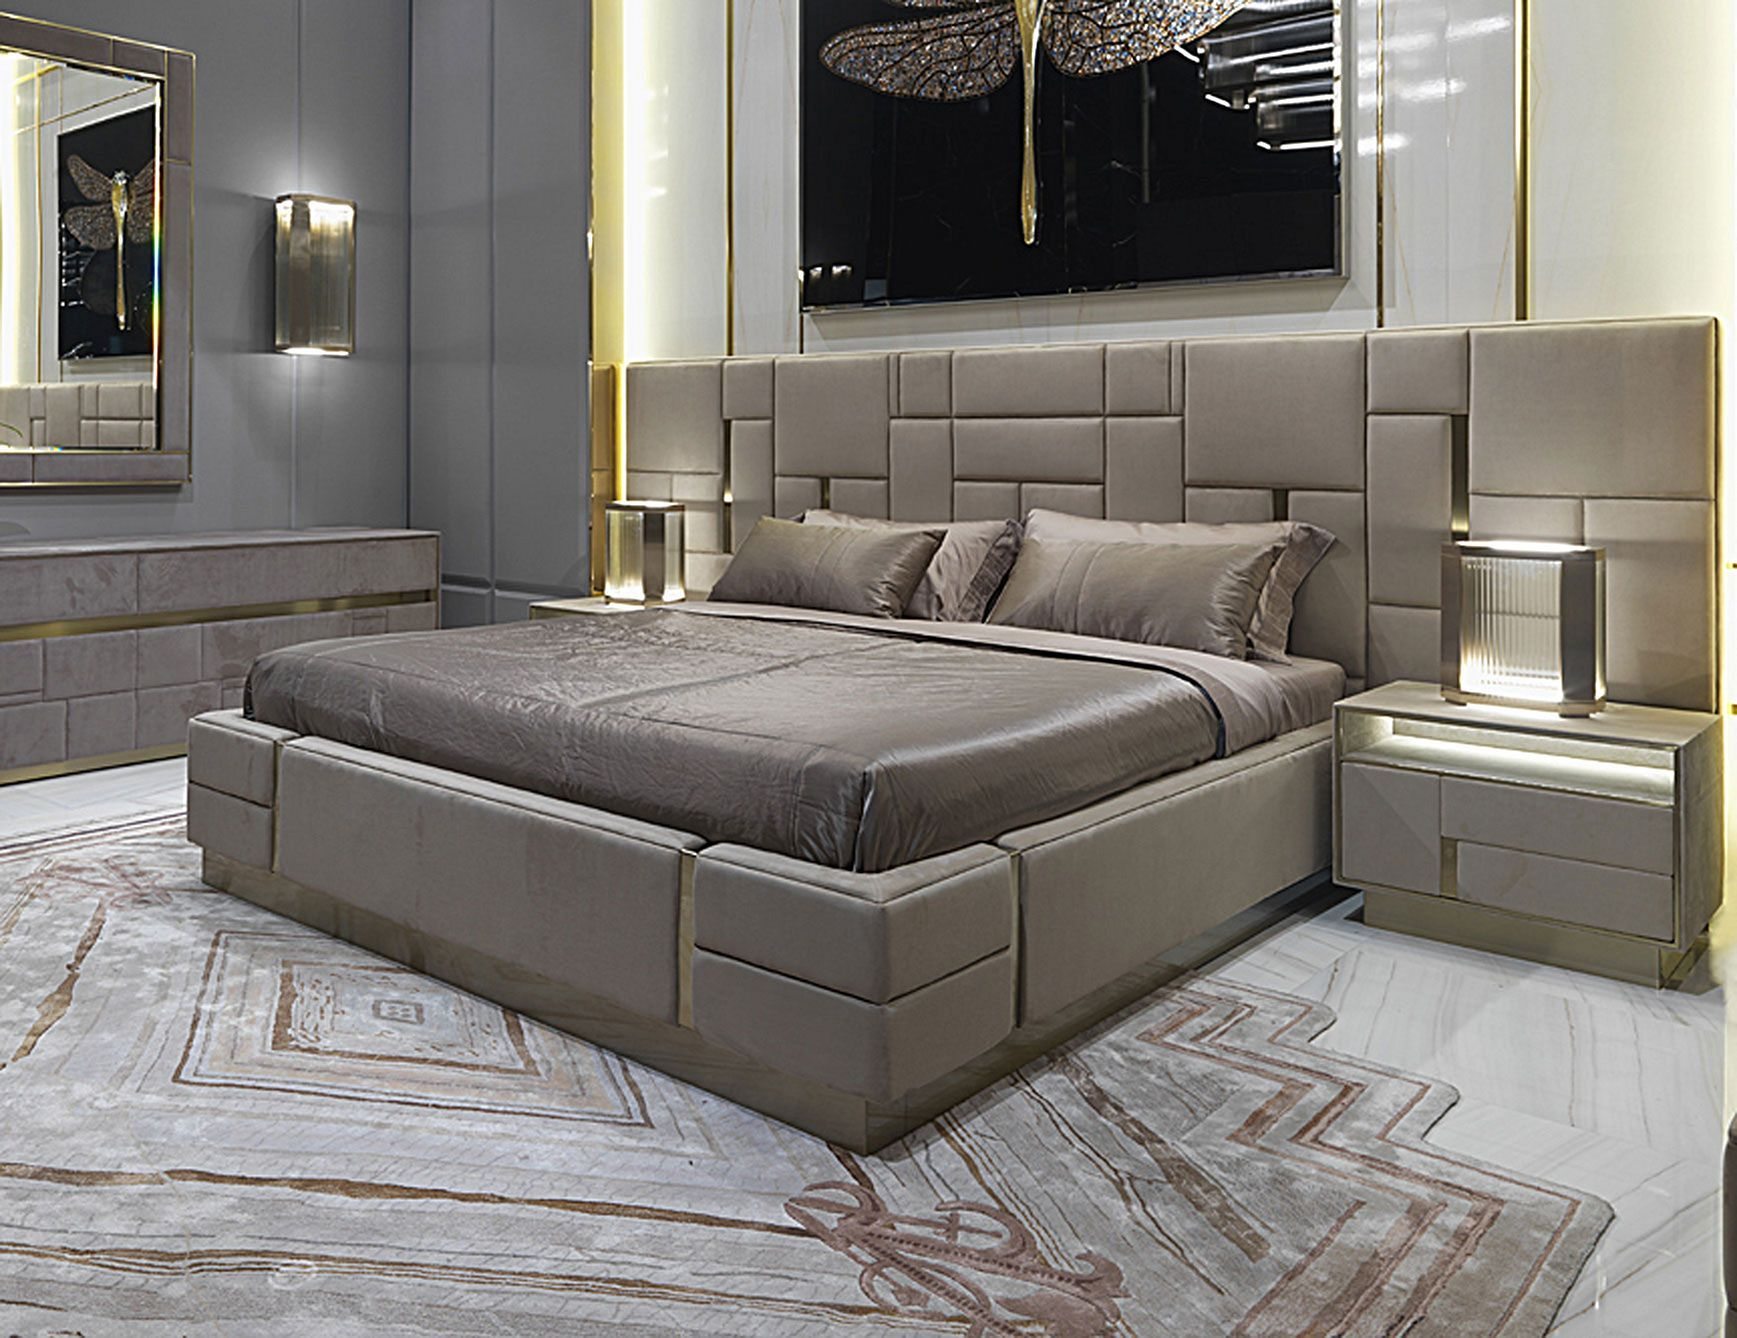 Luxury King Bed Design 6 Bedroom Bed Design Bed Furniture Design Bedroom Furniture Design Modern luxury bedroom set